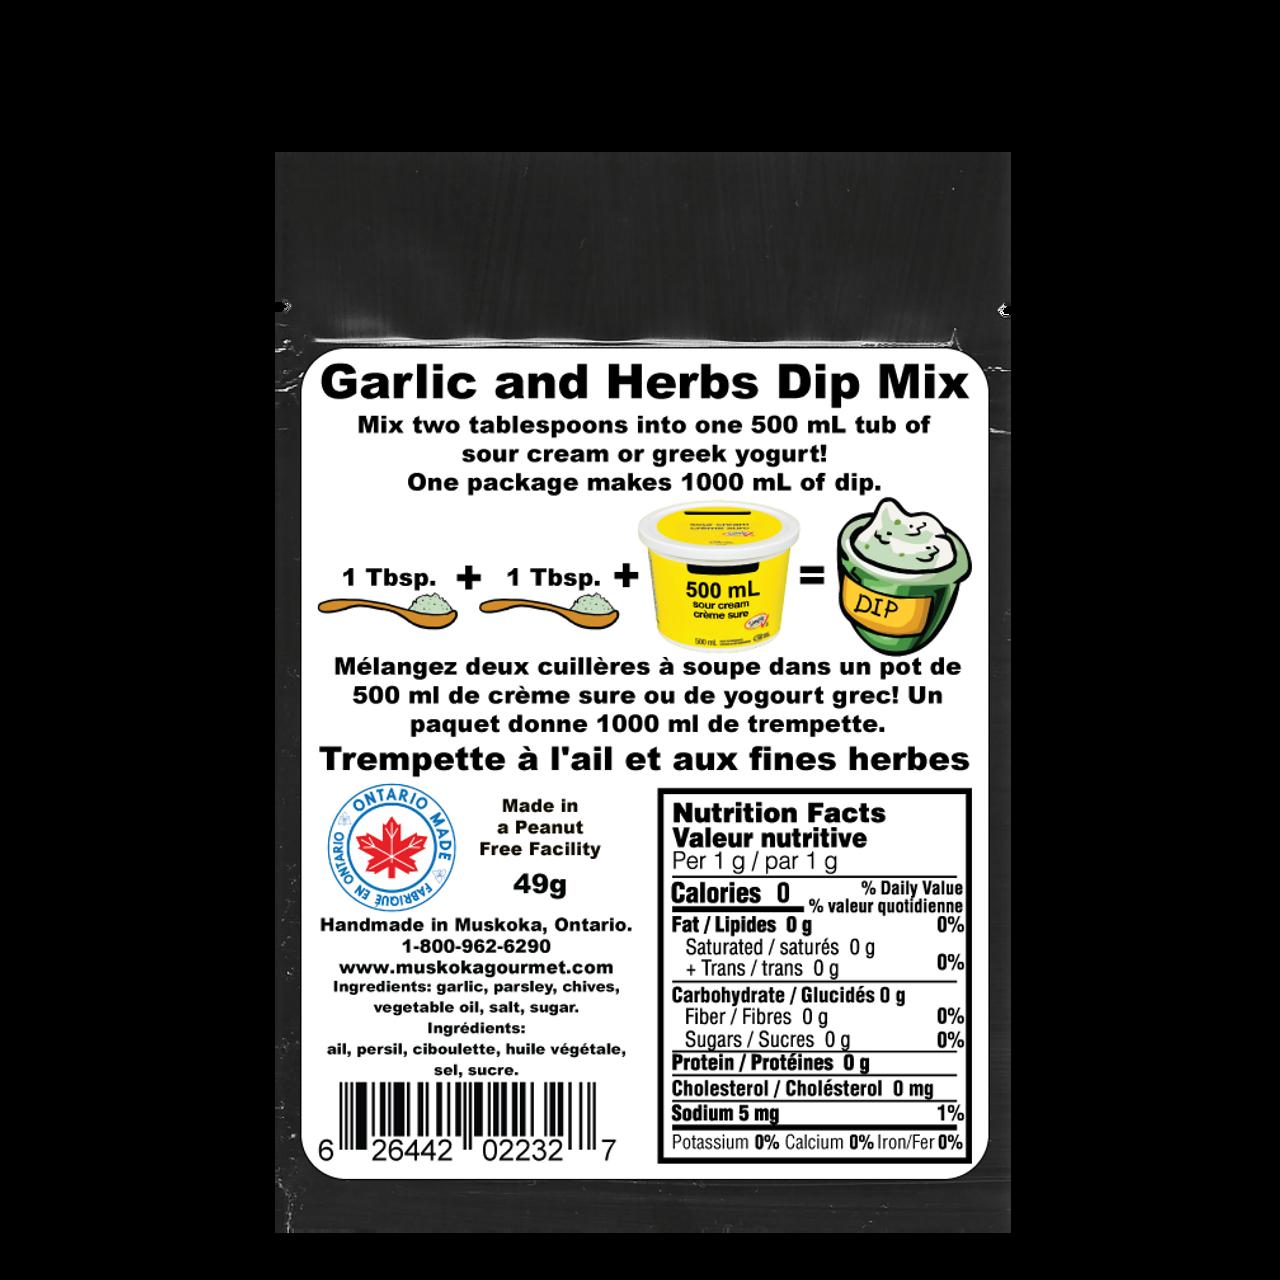 Garlic and Herbs Dip mix